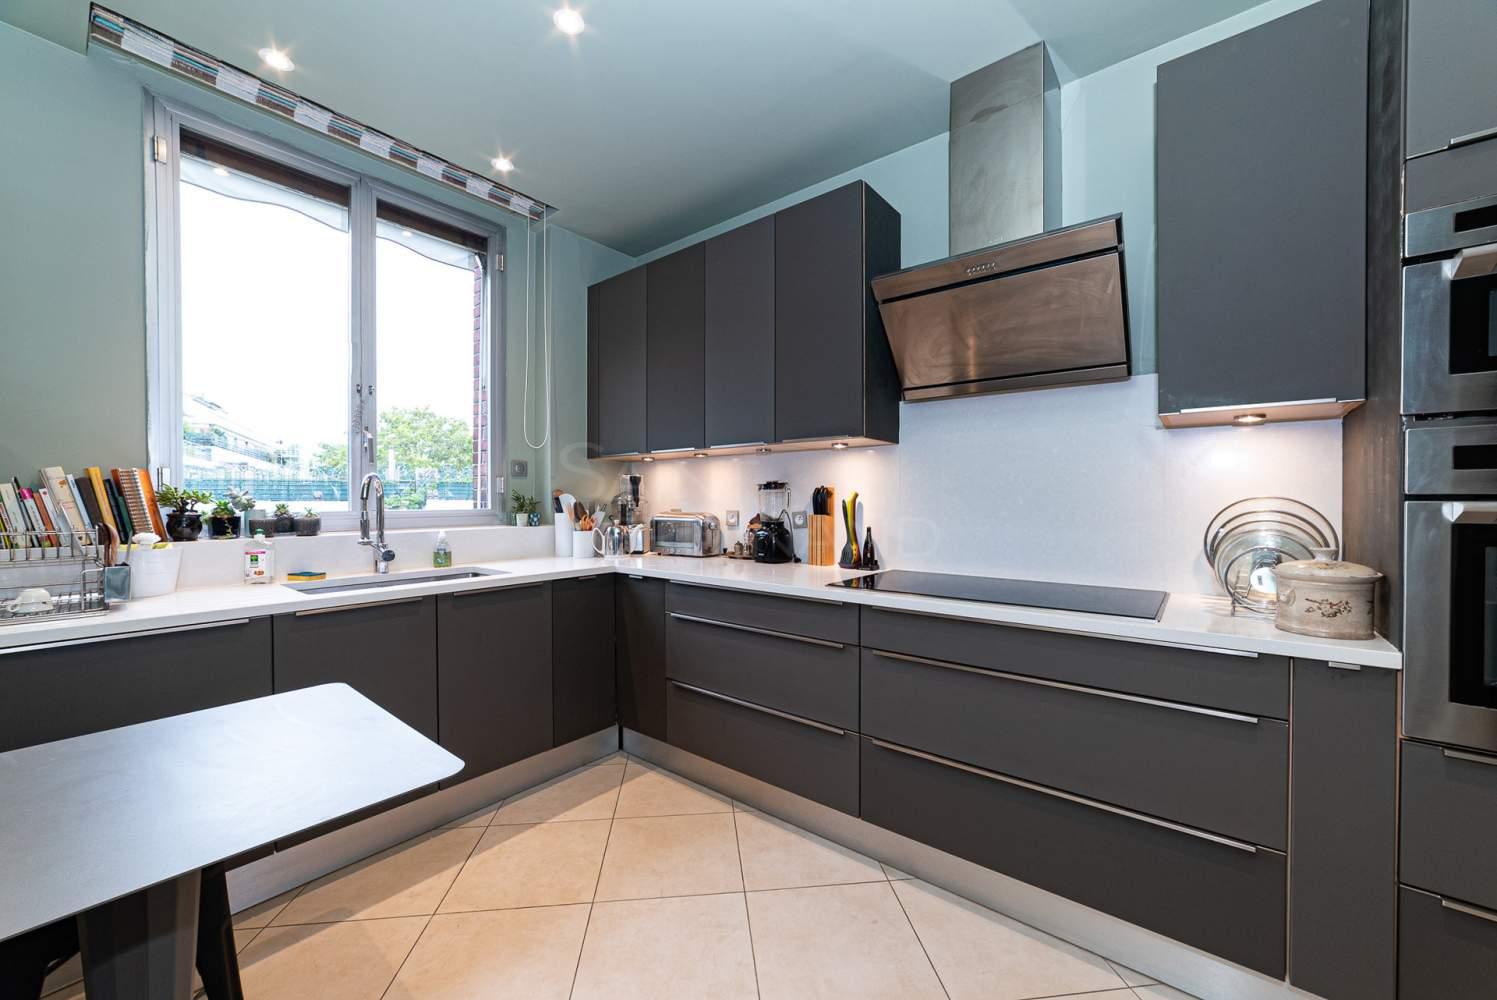 Neuilly-sur-Seine  - Appartement 5 Pièces 2 Chambres - picture 5